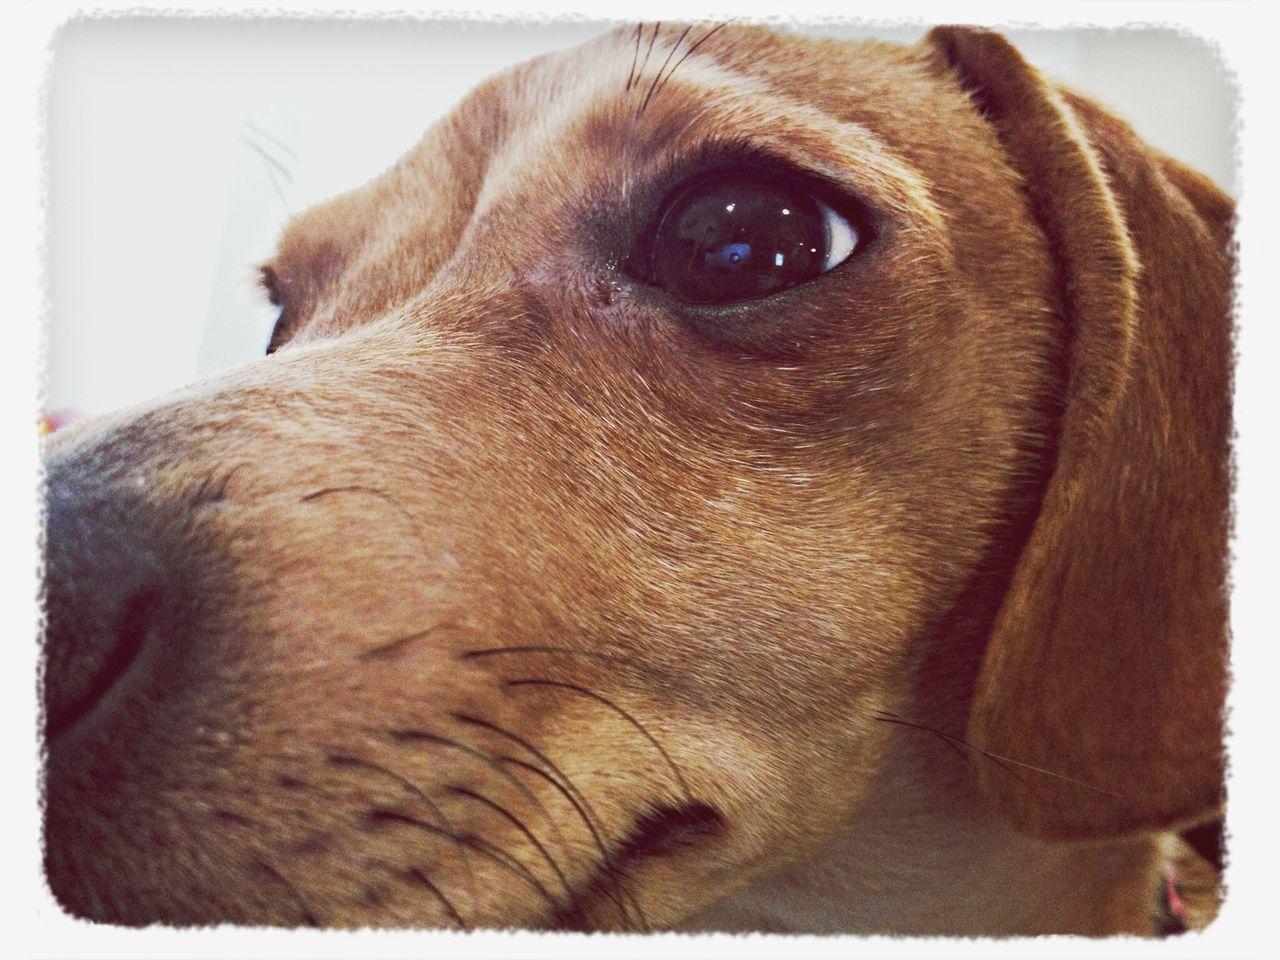 dog, pets, one animal, mammal, domestic animals, close-up, animal head, animal themes, no people, portrait, indoors, day